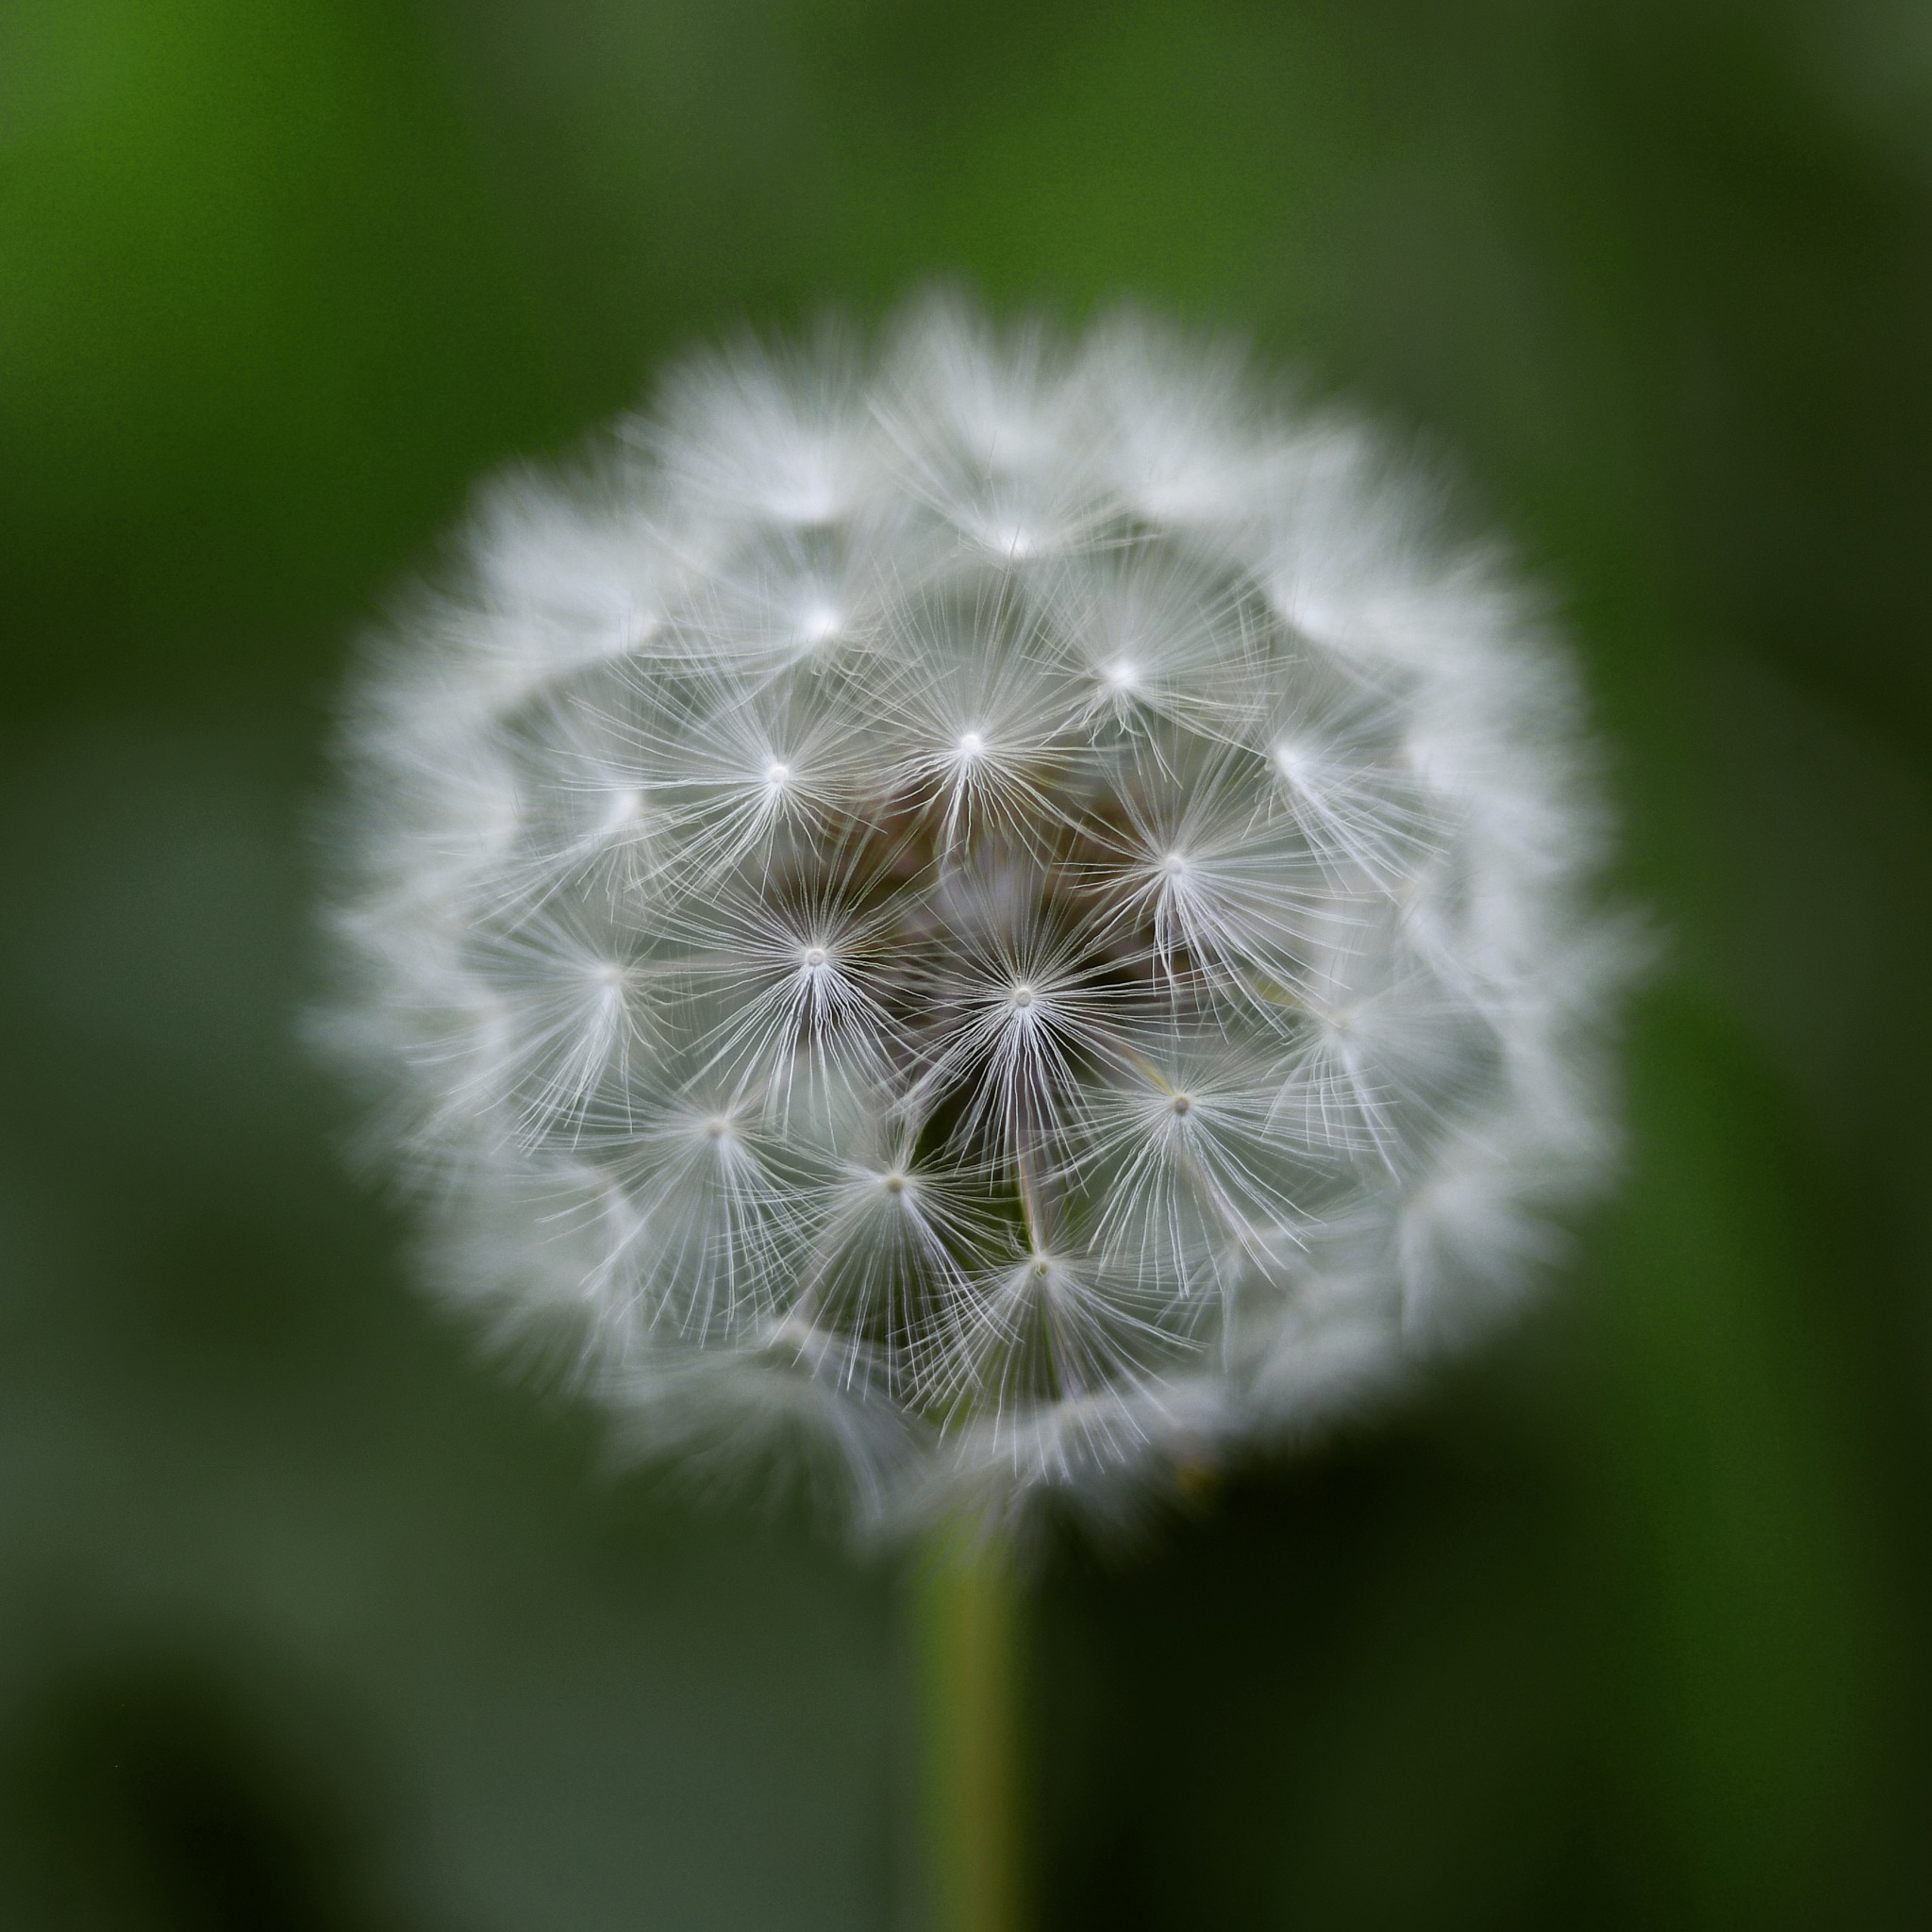 Every One a Wish by Goleudy